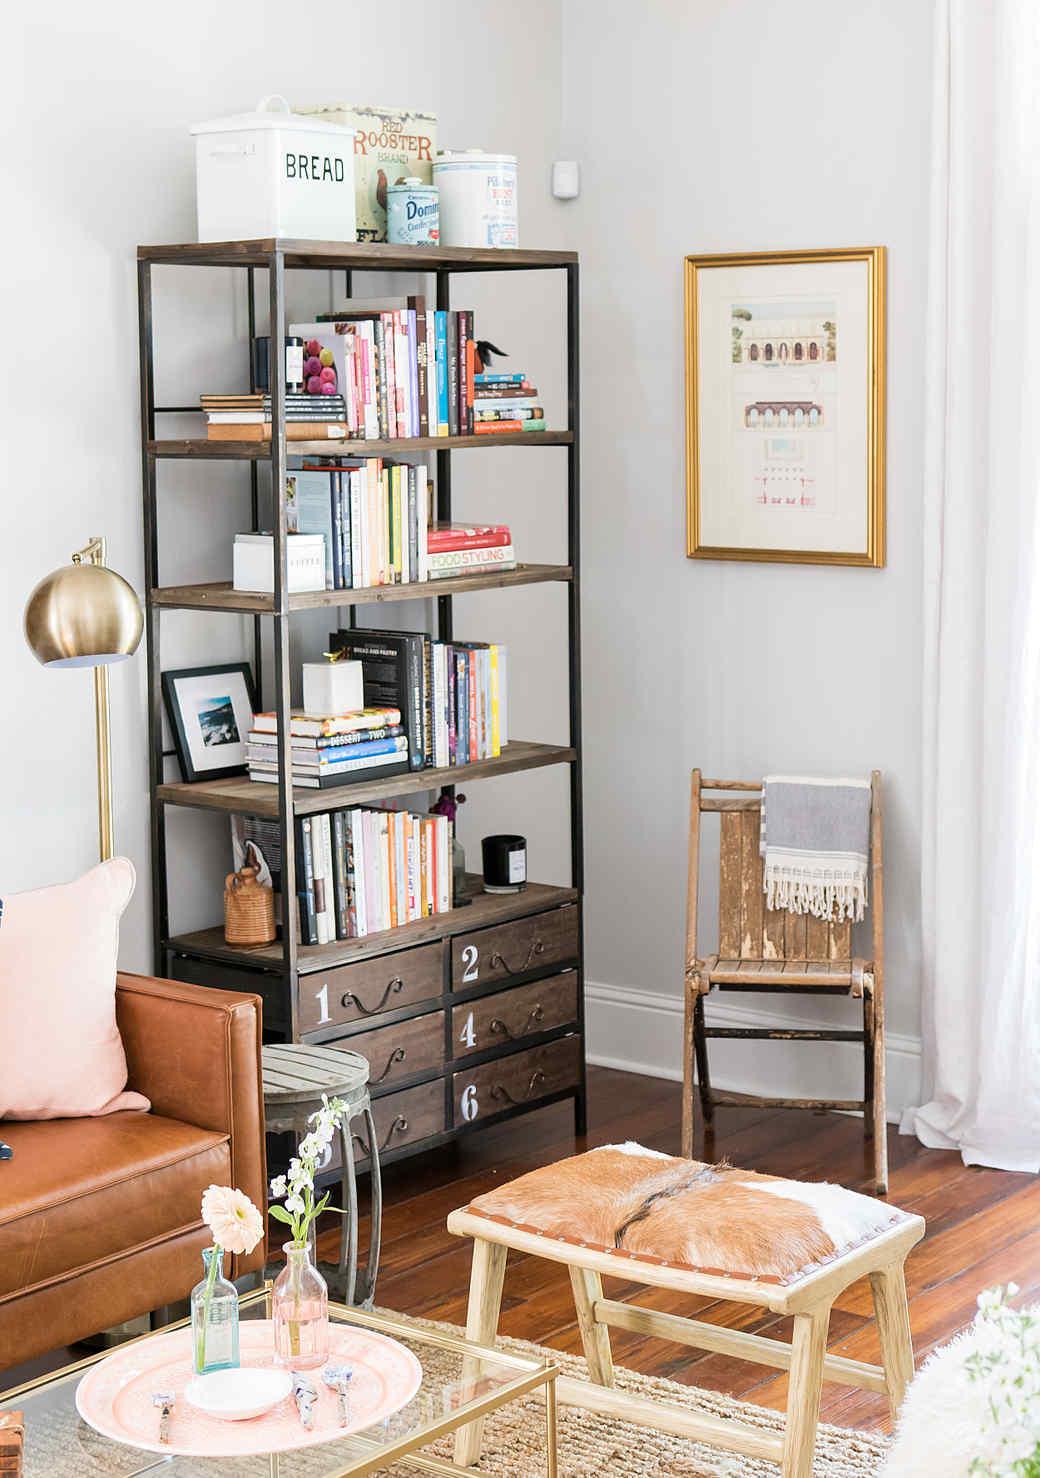 joy the baker living room shelf display